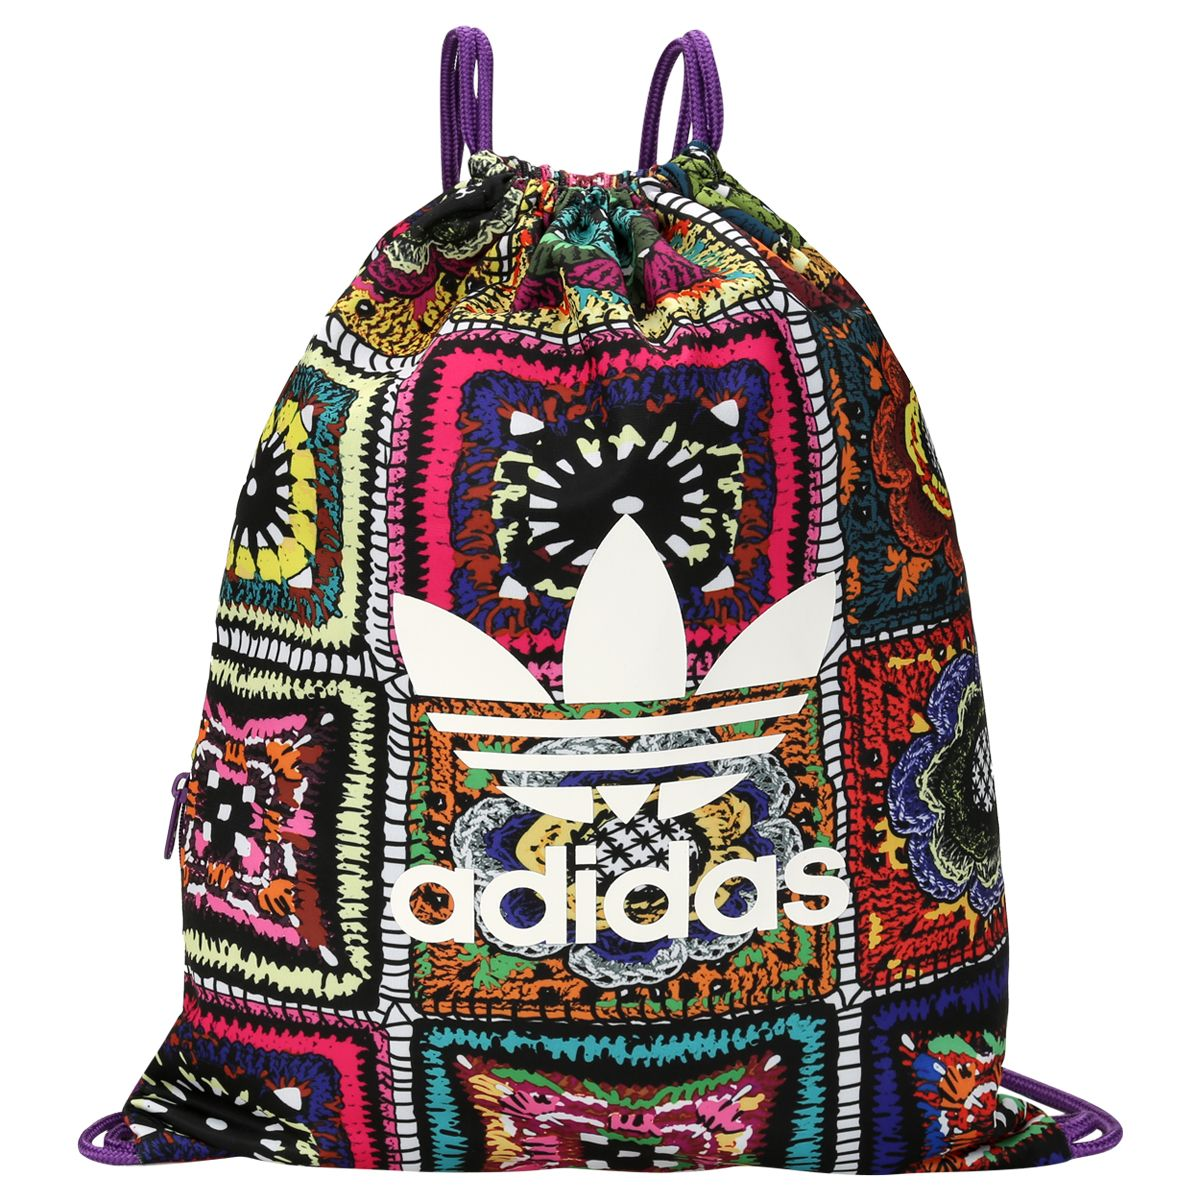 2019 Rucksäcke Damen adidas Rucksack Crochita Classic